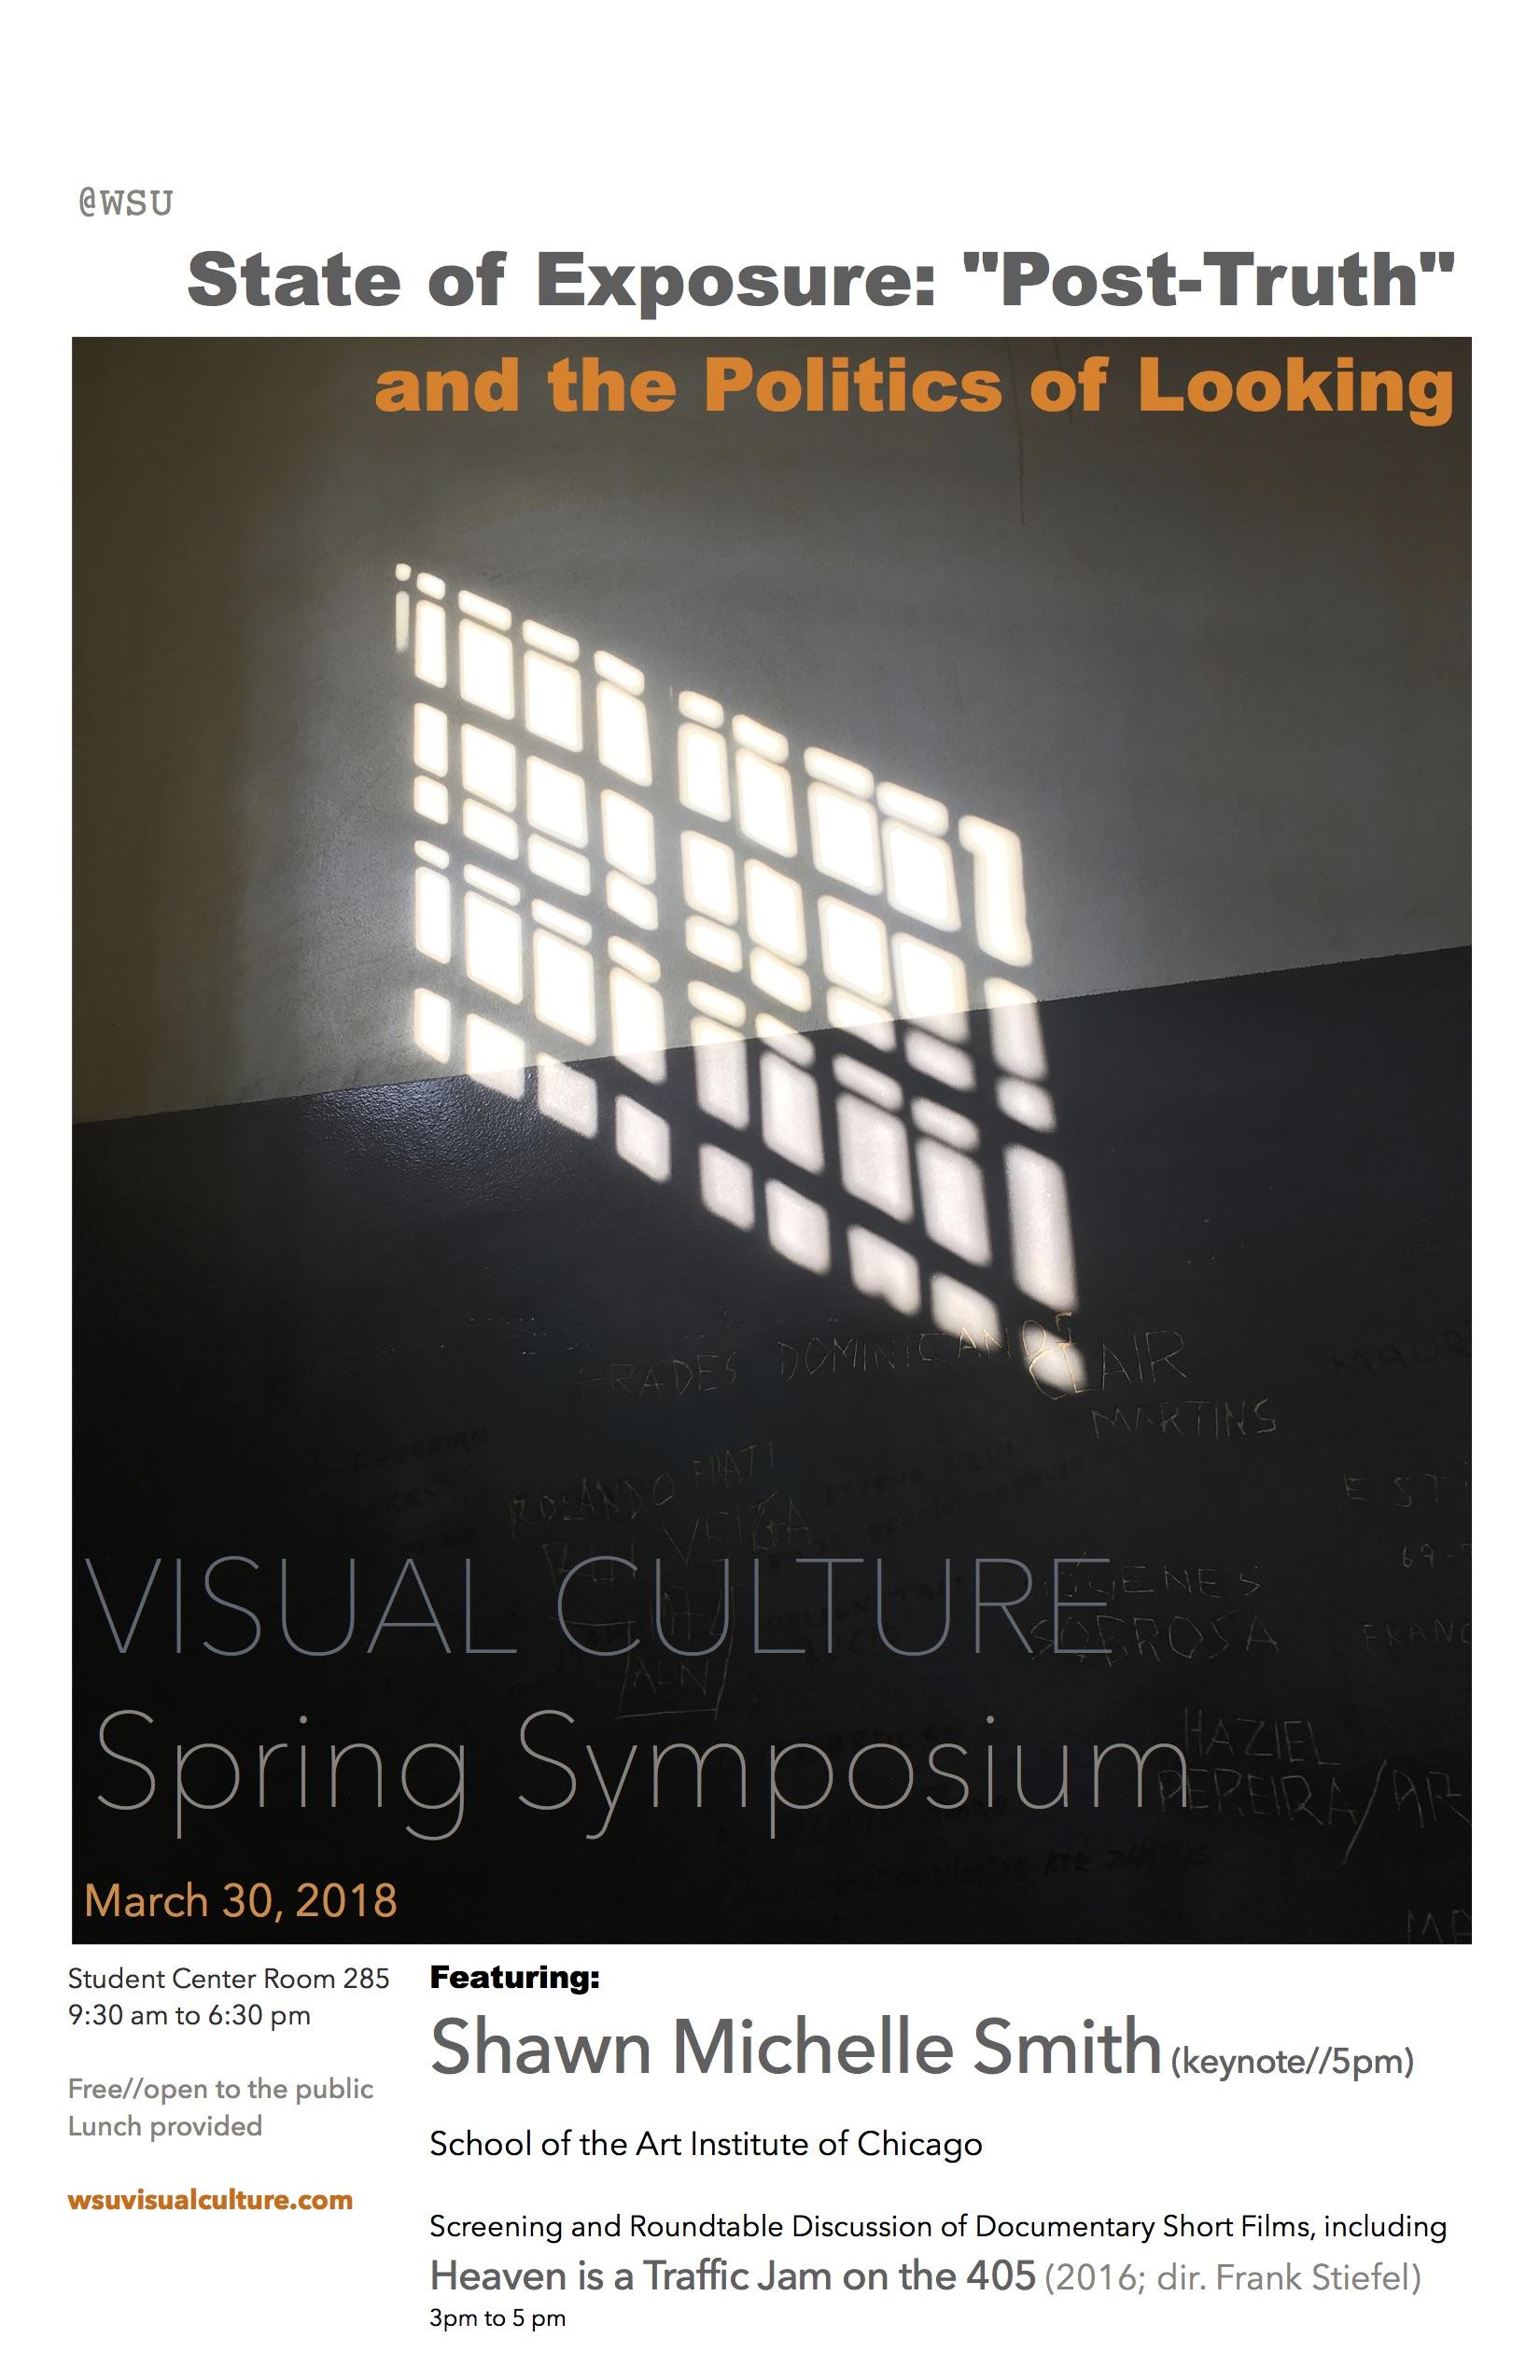 VC 2018 Poster Image.jpg